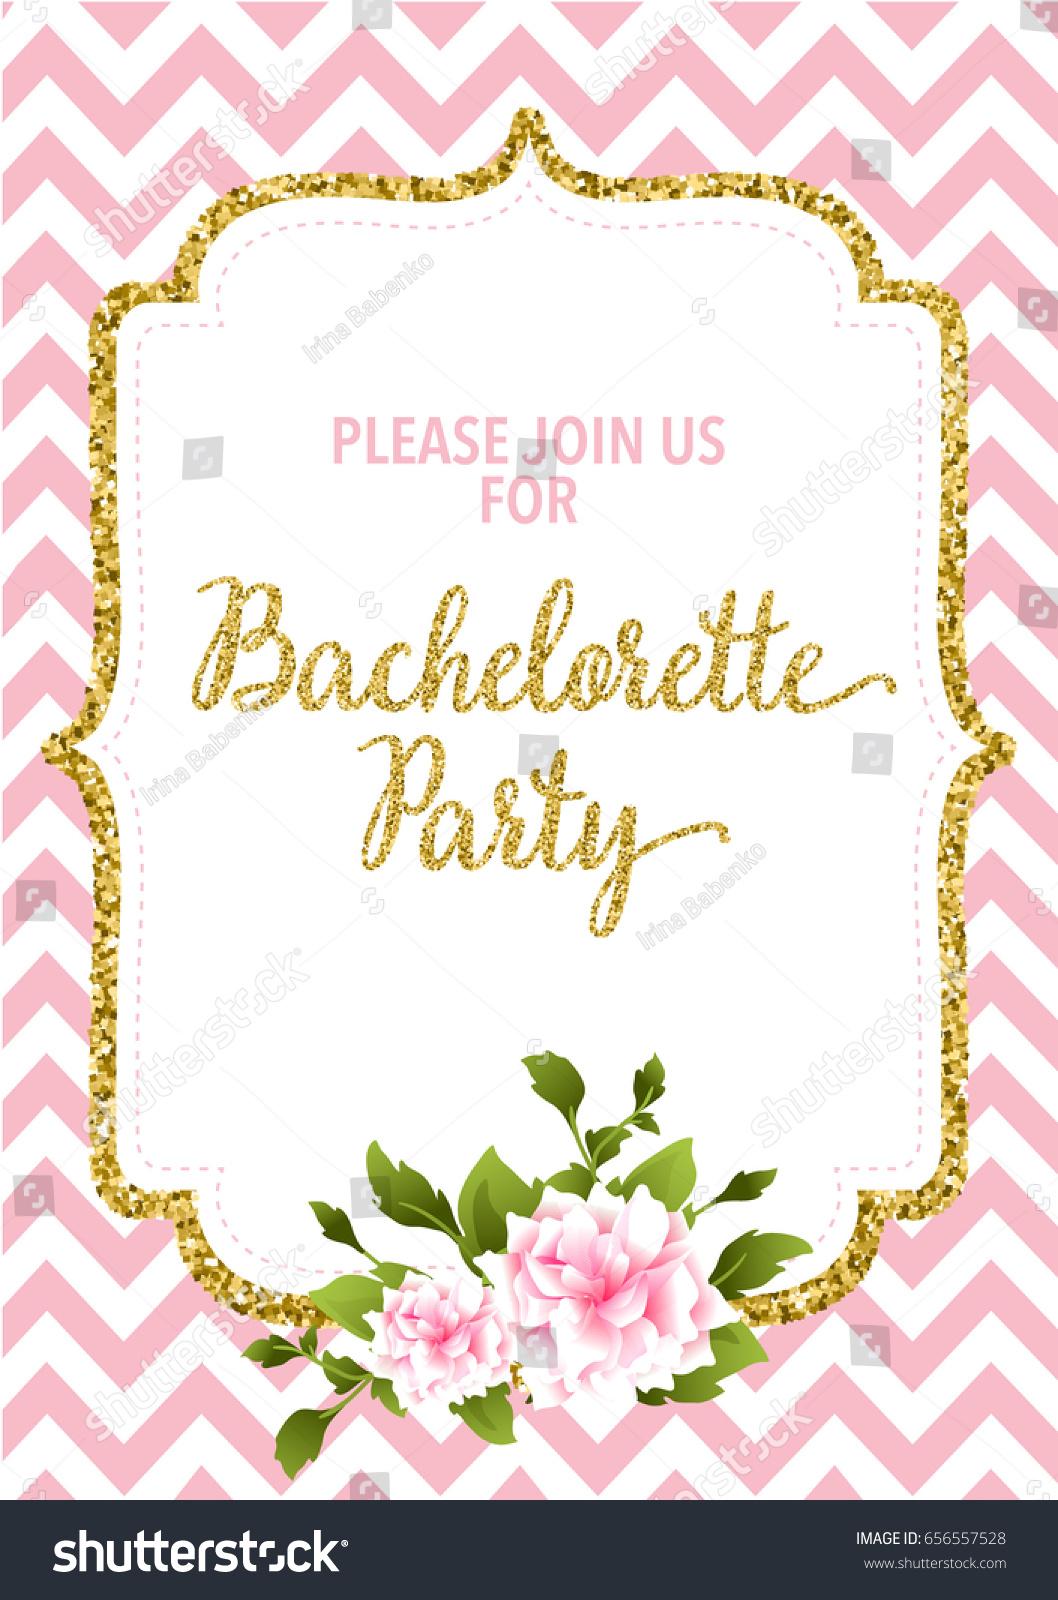 Hen Party Invitation Card Ez Canvas